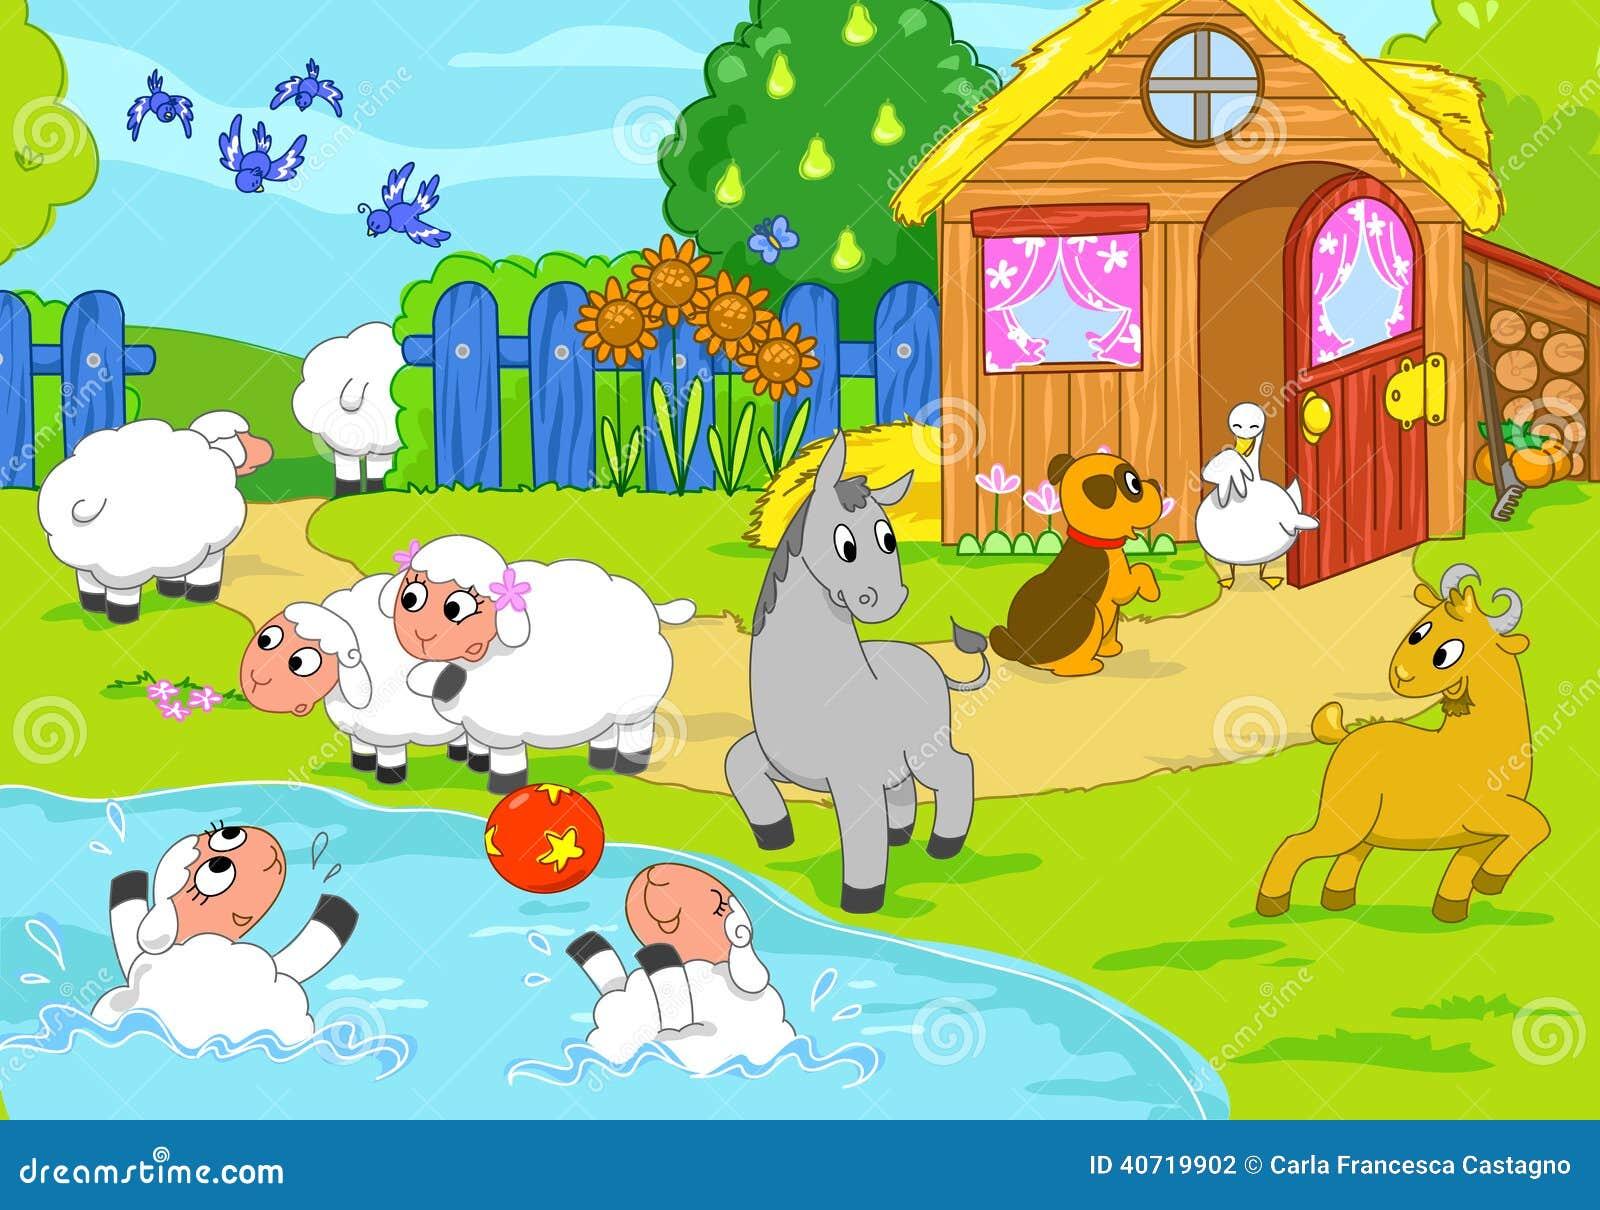 Farm And Playing Animals Digital Illustration Stock